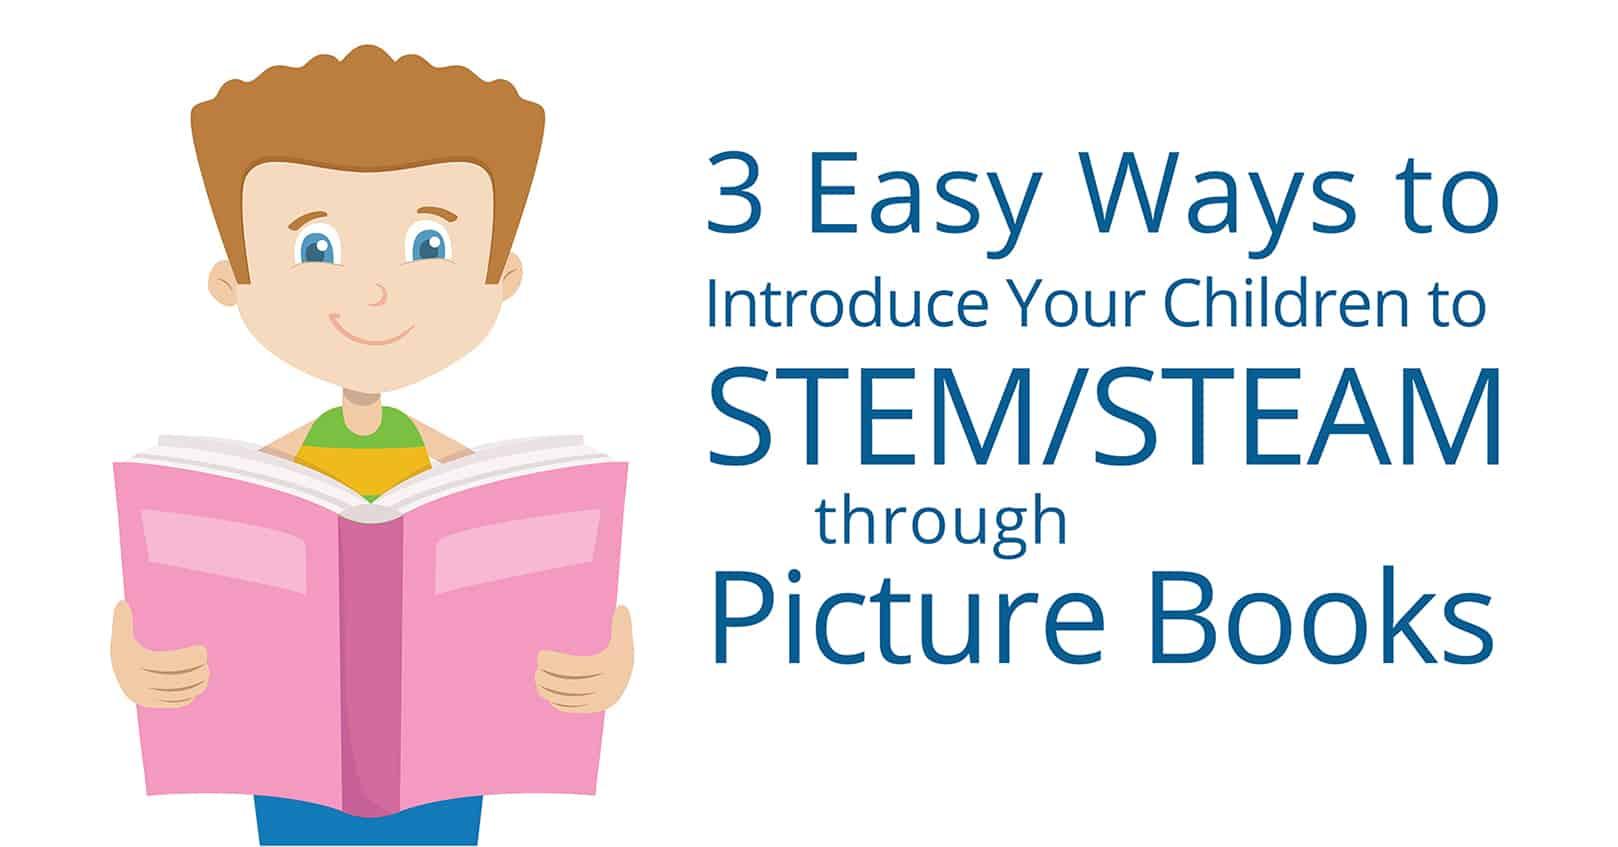 introduce children to STEM through picture books